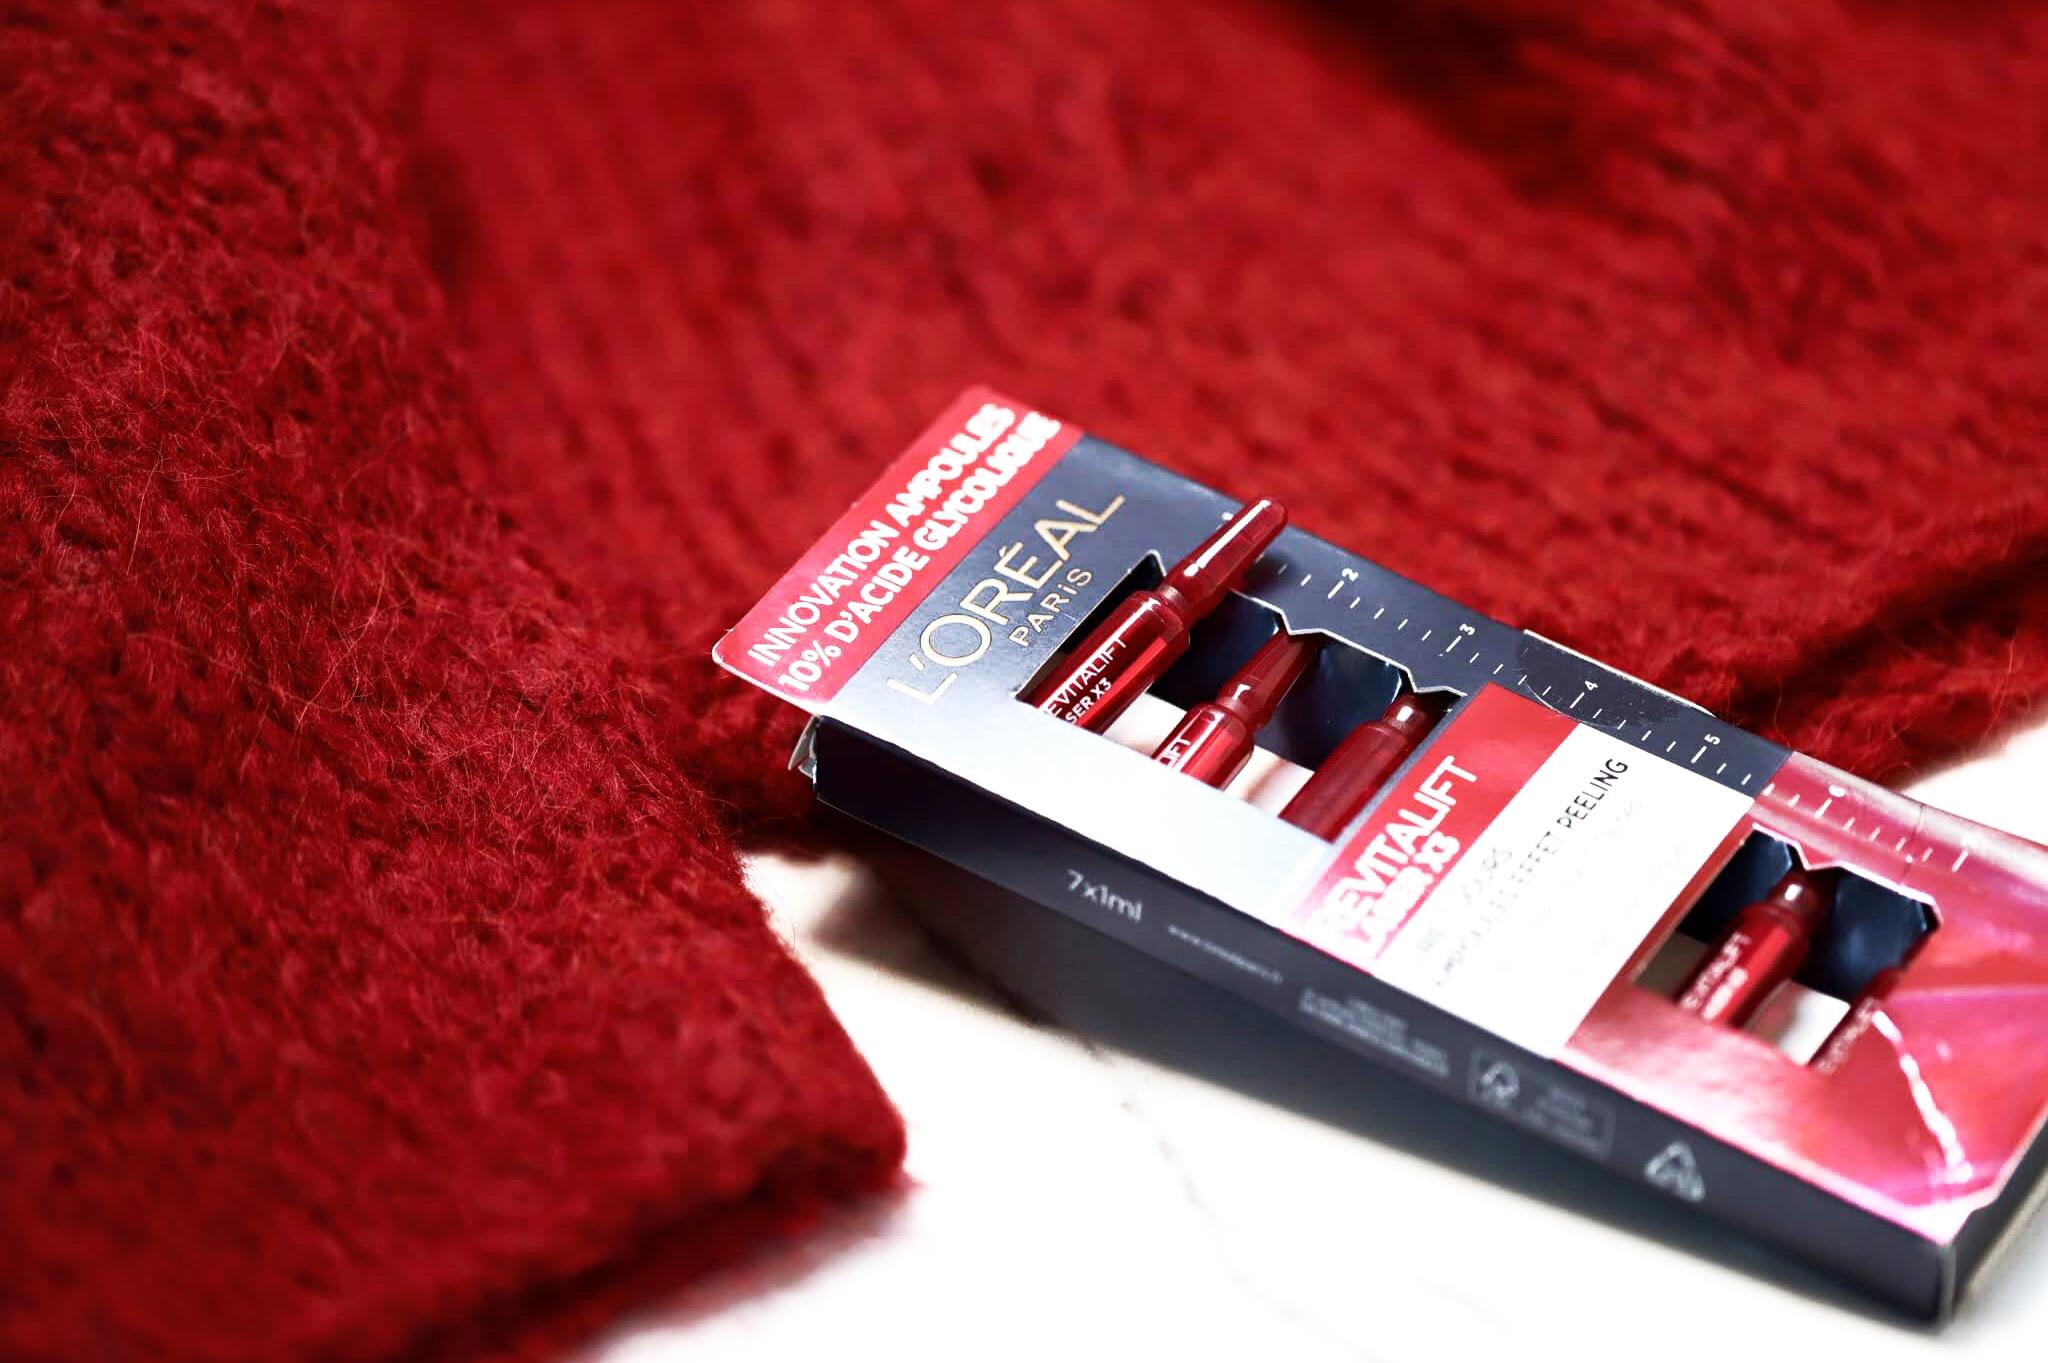 L'Oreal Revitalift Laser x3 Cure Peeling Ampoules